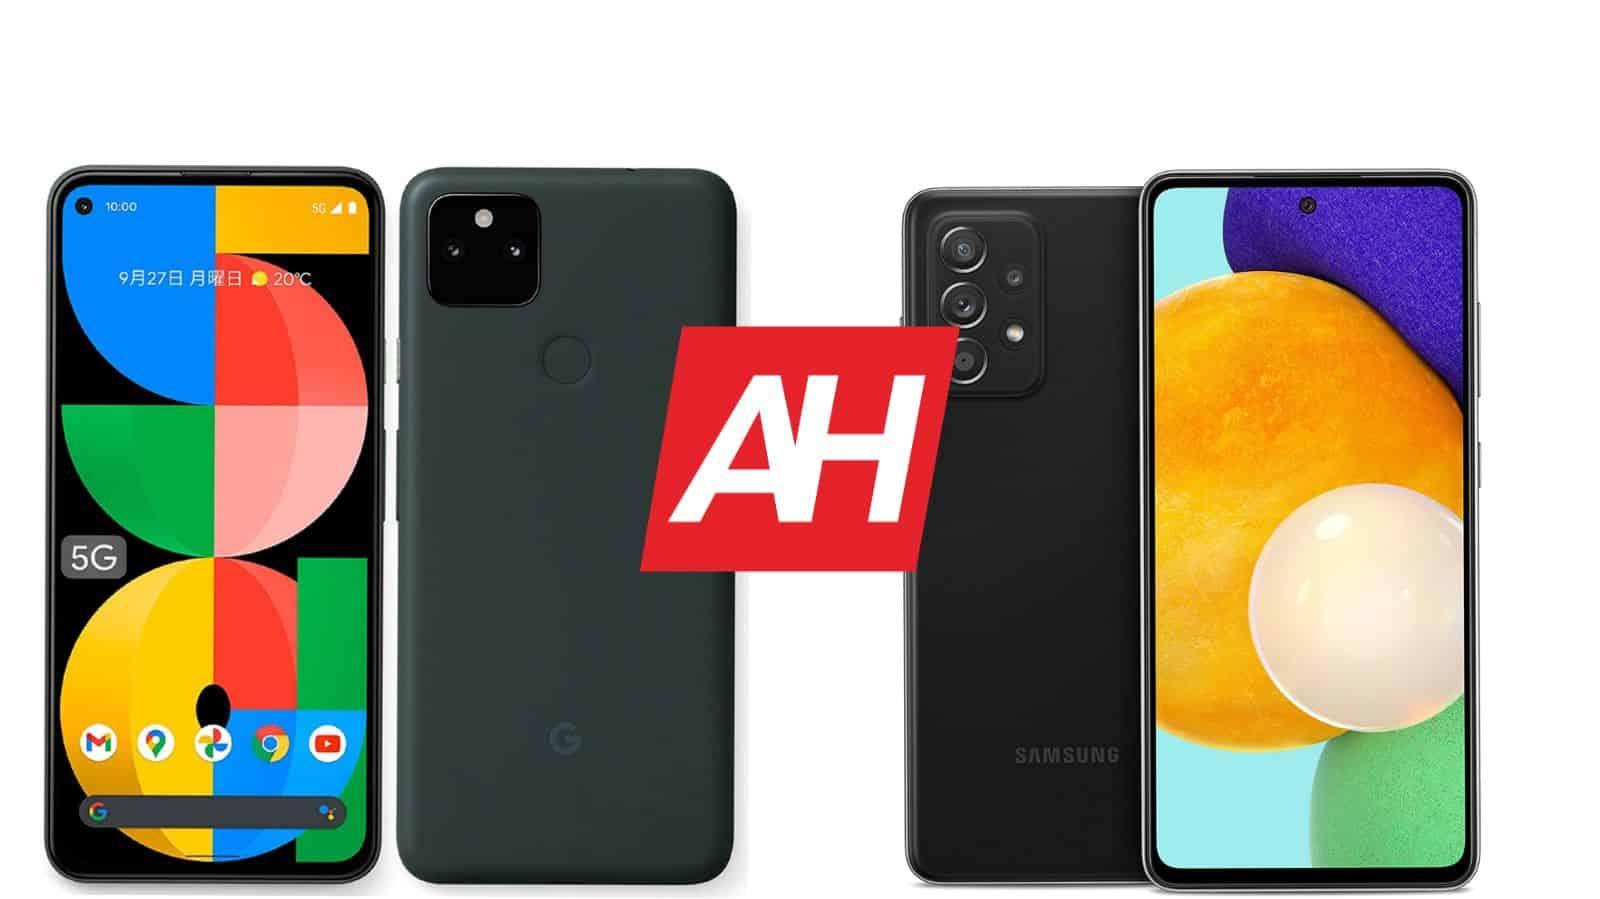 AH Google Pixel 5a 5G vs Samsung Galaxy A52 5G comparison